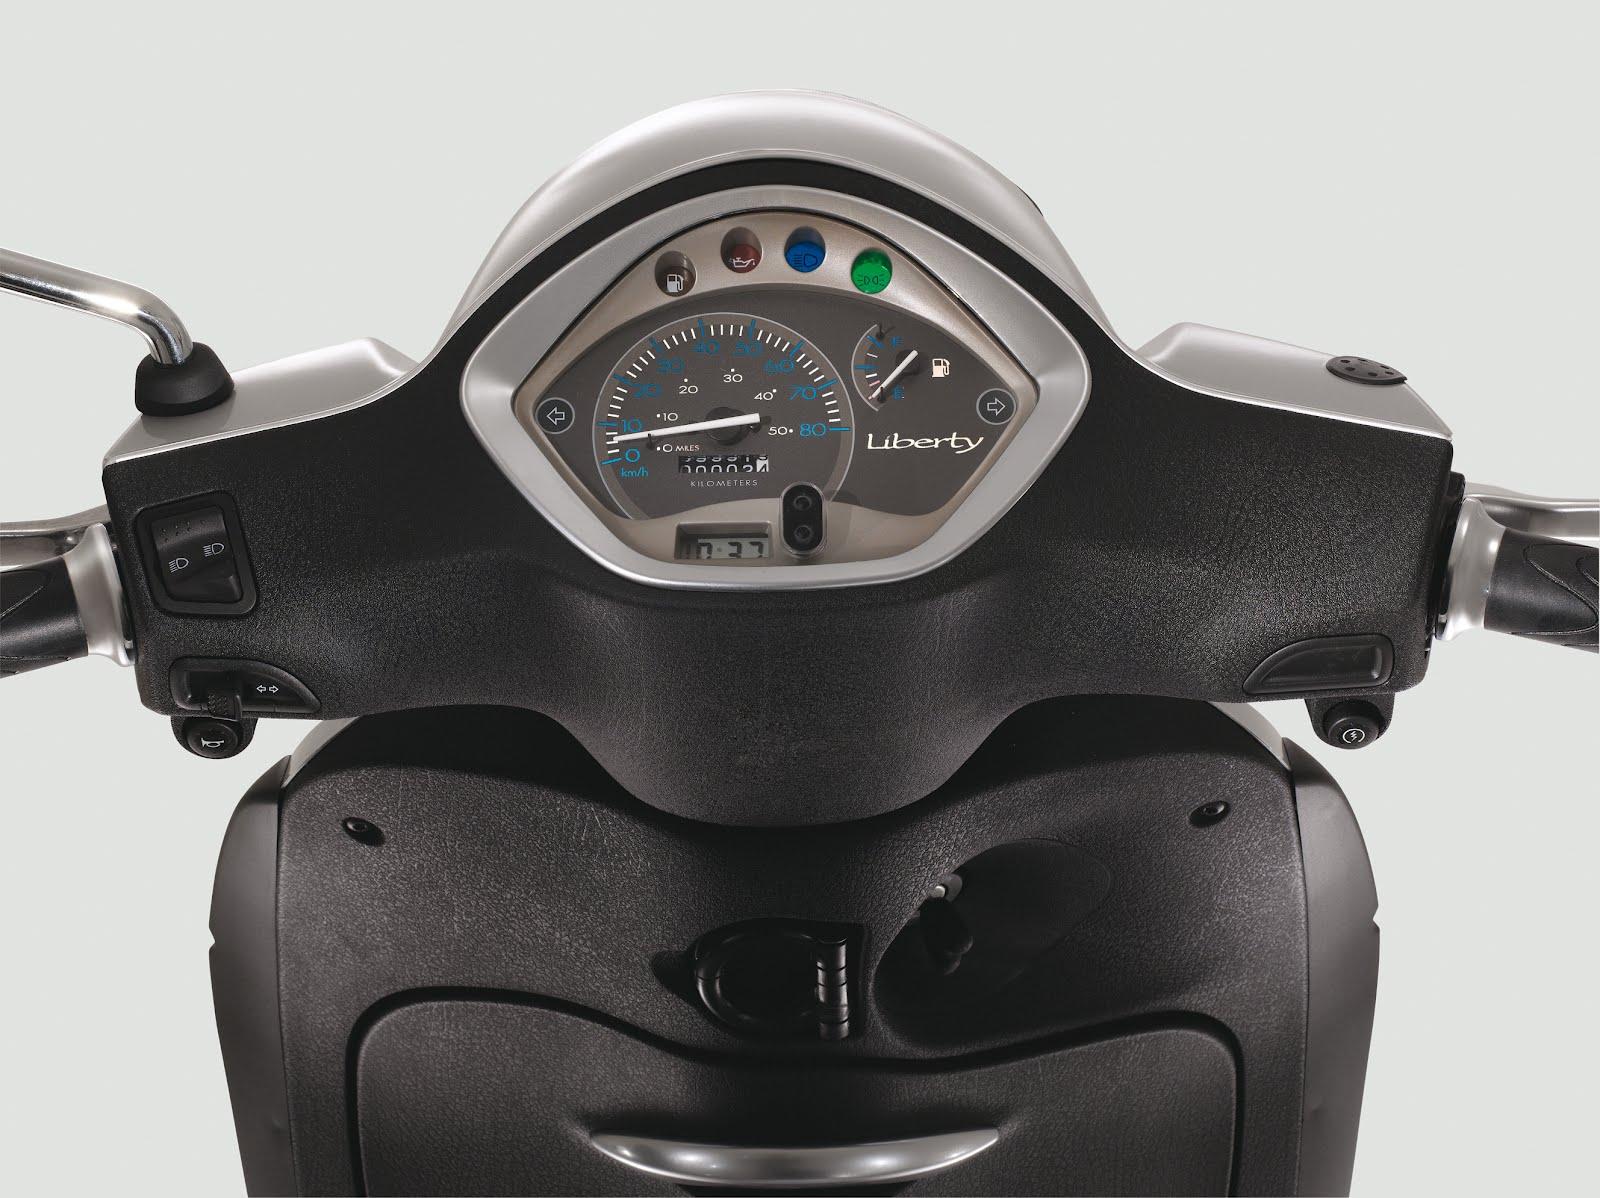 premium italian bikes & scooters: piaggio liberty 150 ie